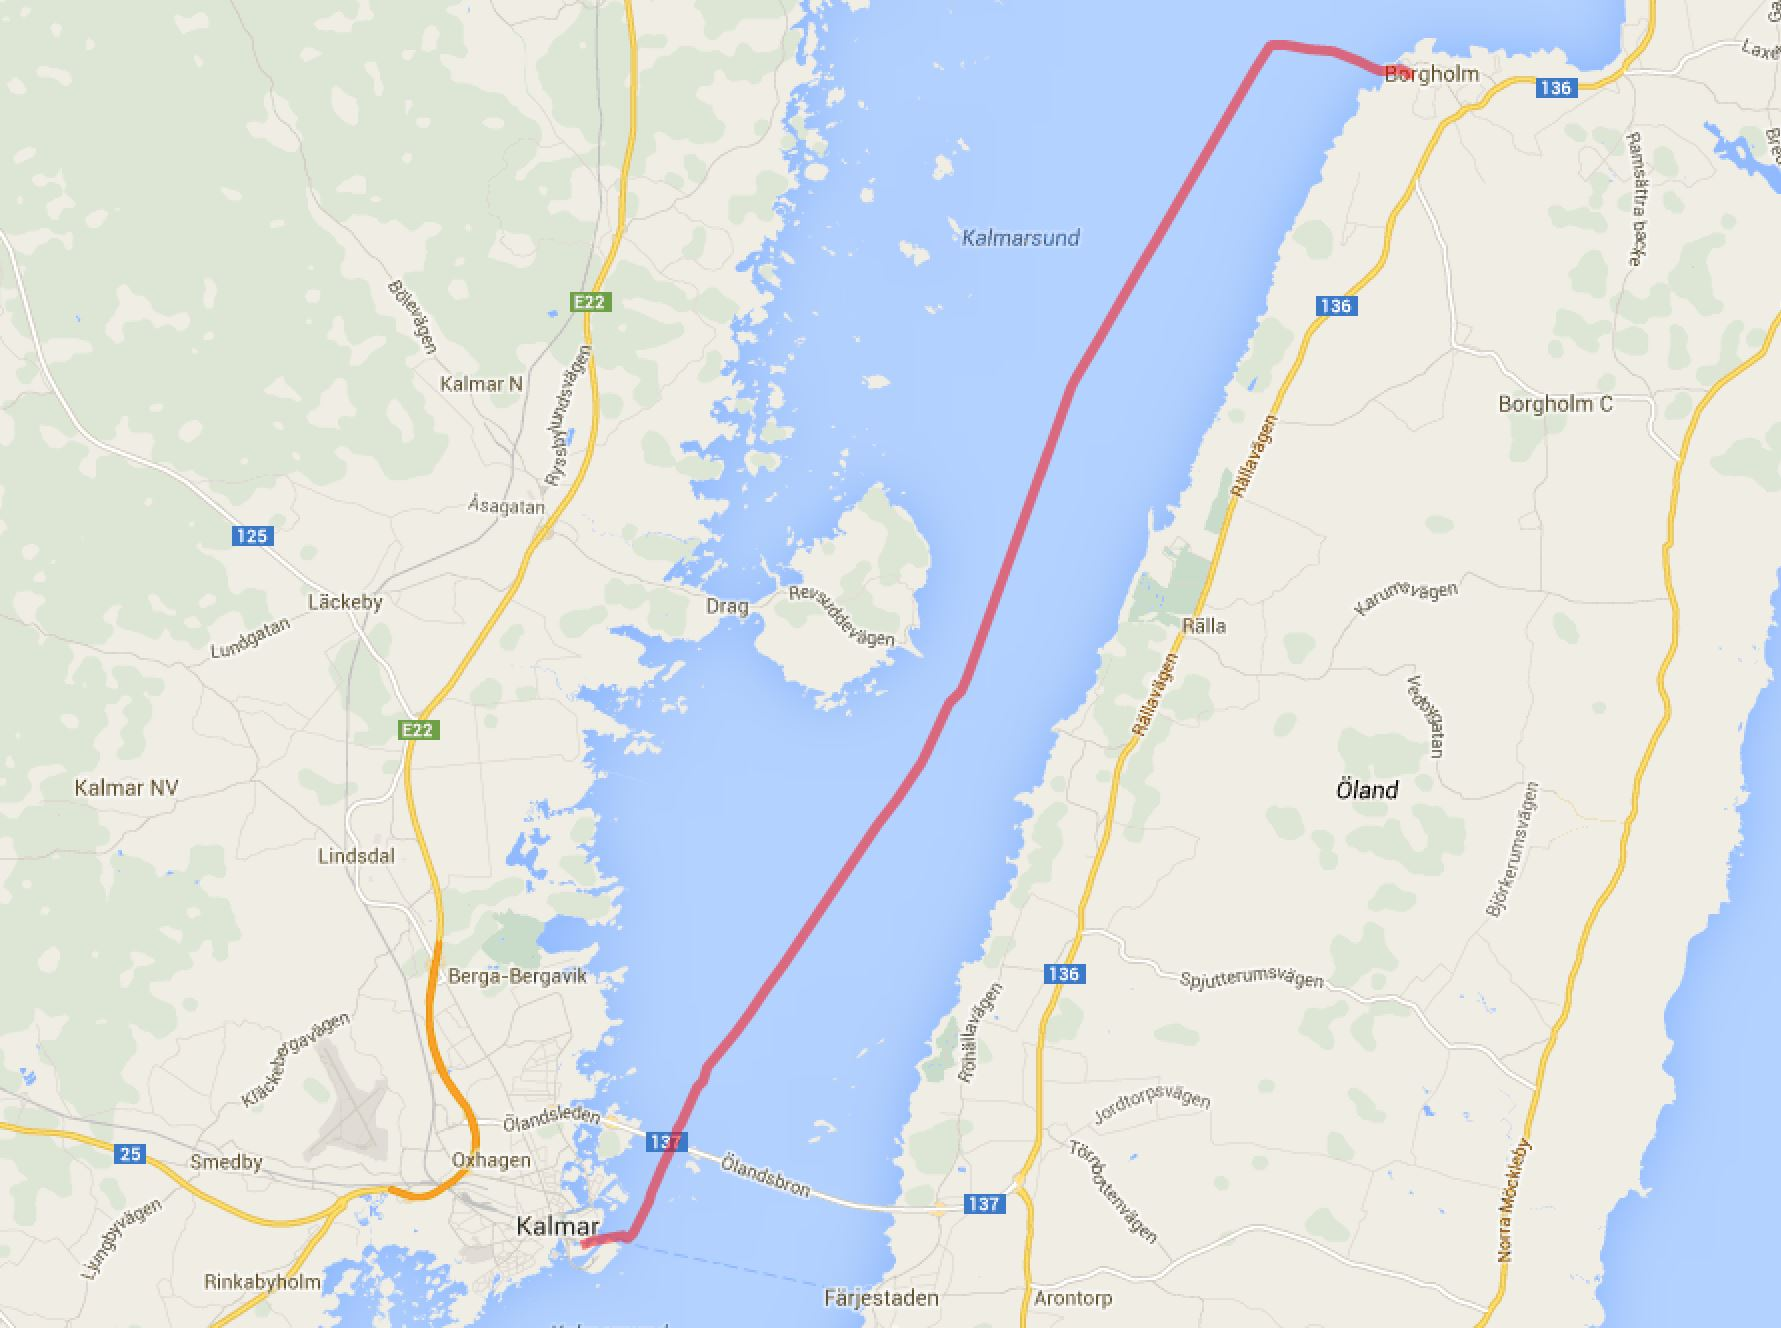 Kalmar - Borgholm